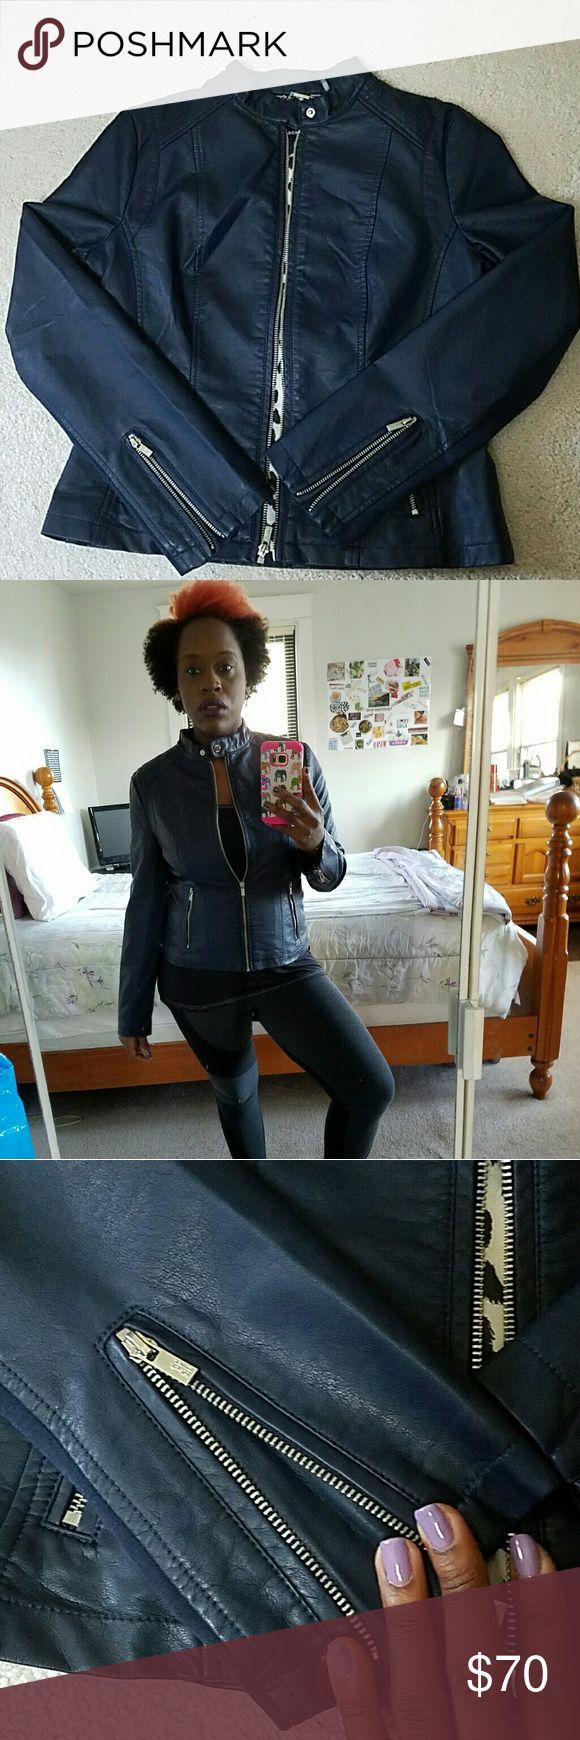 Selling this Midnight Blue Vegan Leather Jacket on Poshmark! My username is: jmickey317. #shopmycloset #poshmark #fashion #shopping #style #forsale #Black Rivet #Jackets & Blazers